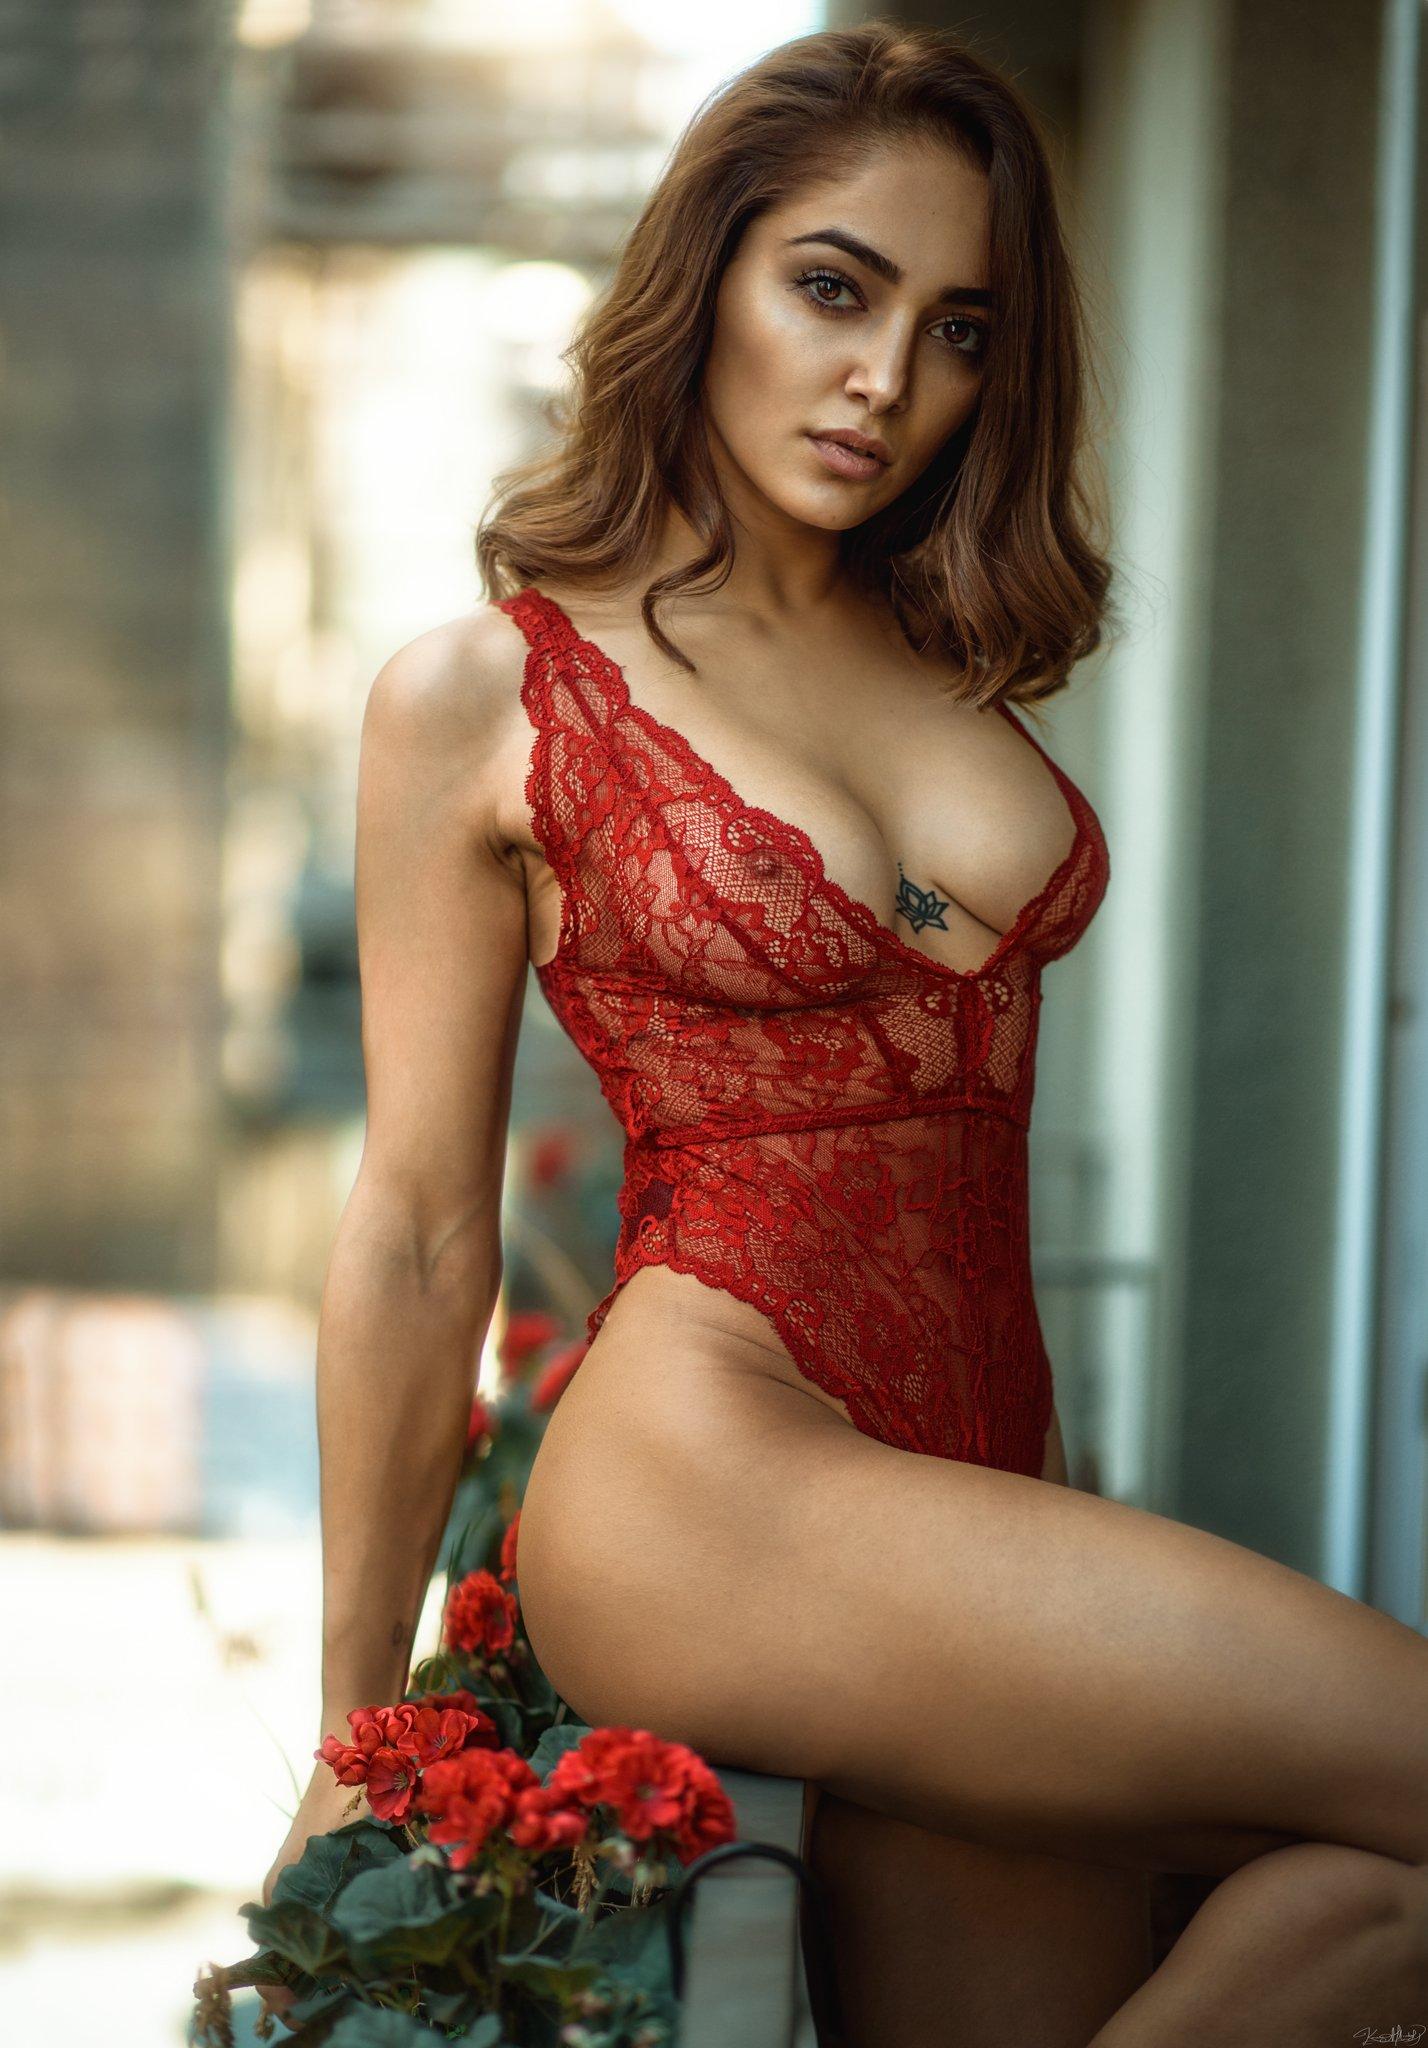 sexy, body, model, red, glamour, eyes, hair, face, beauty, natural, light, beautiful, pretty, nikon, 85mm, Каан Алтындал